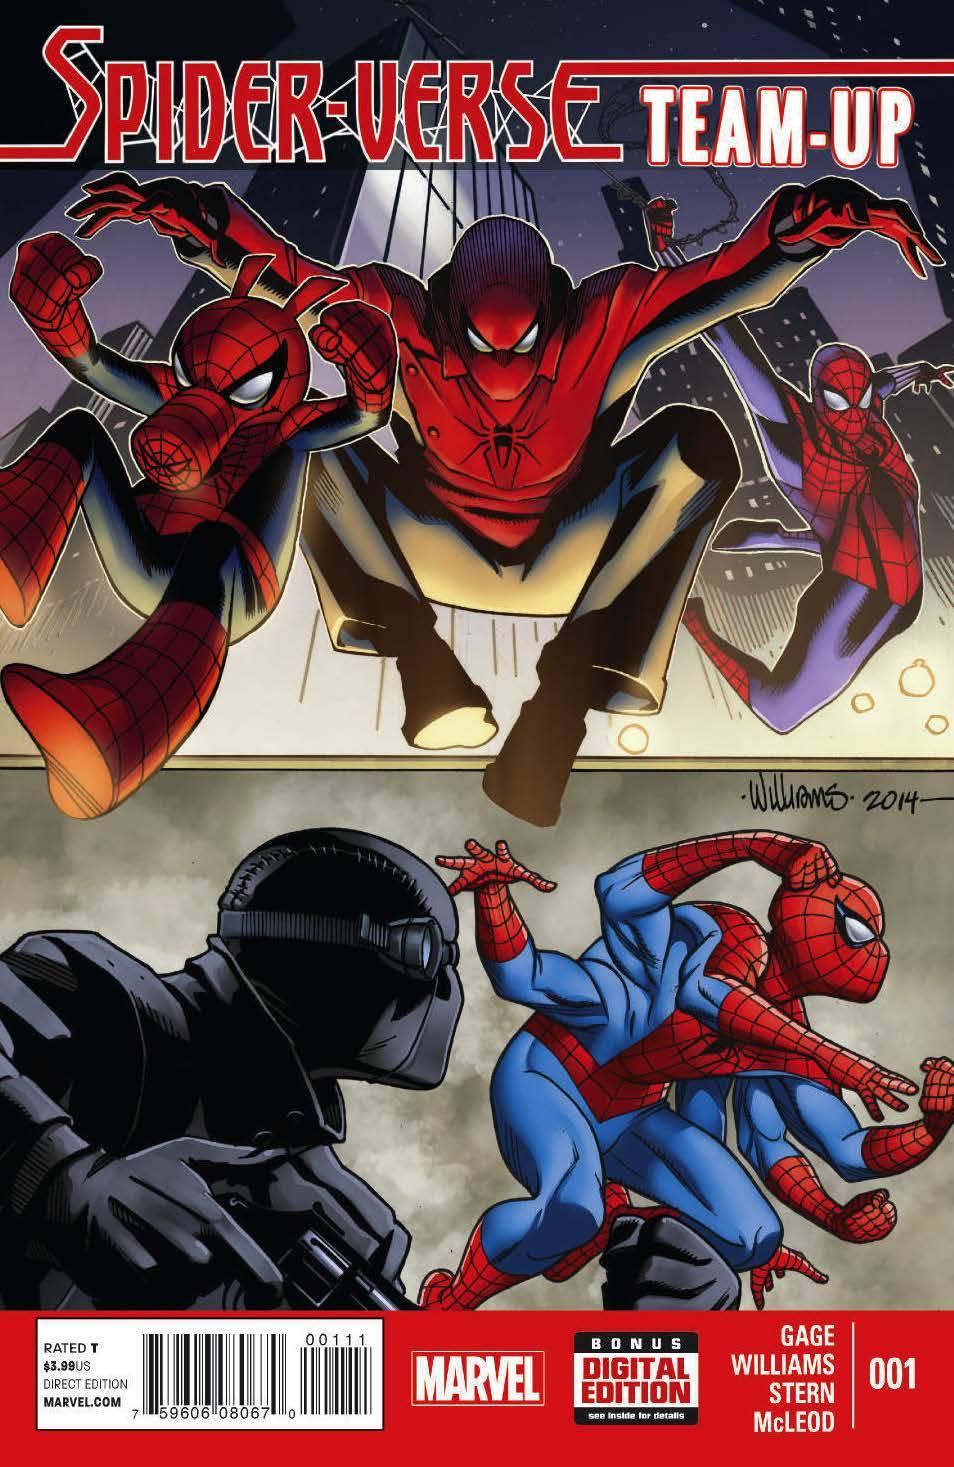 Spider-Verse Team Up (2014) Complete Bundle - Used